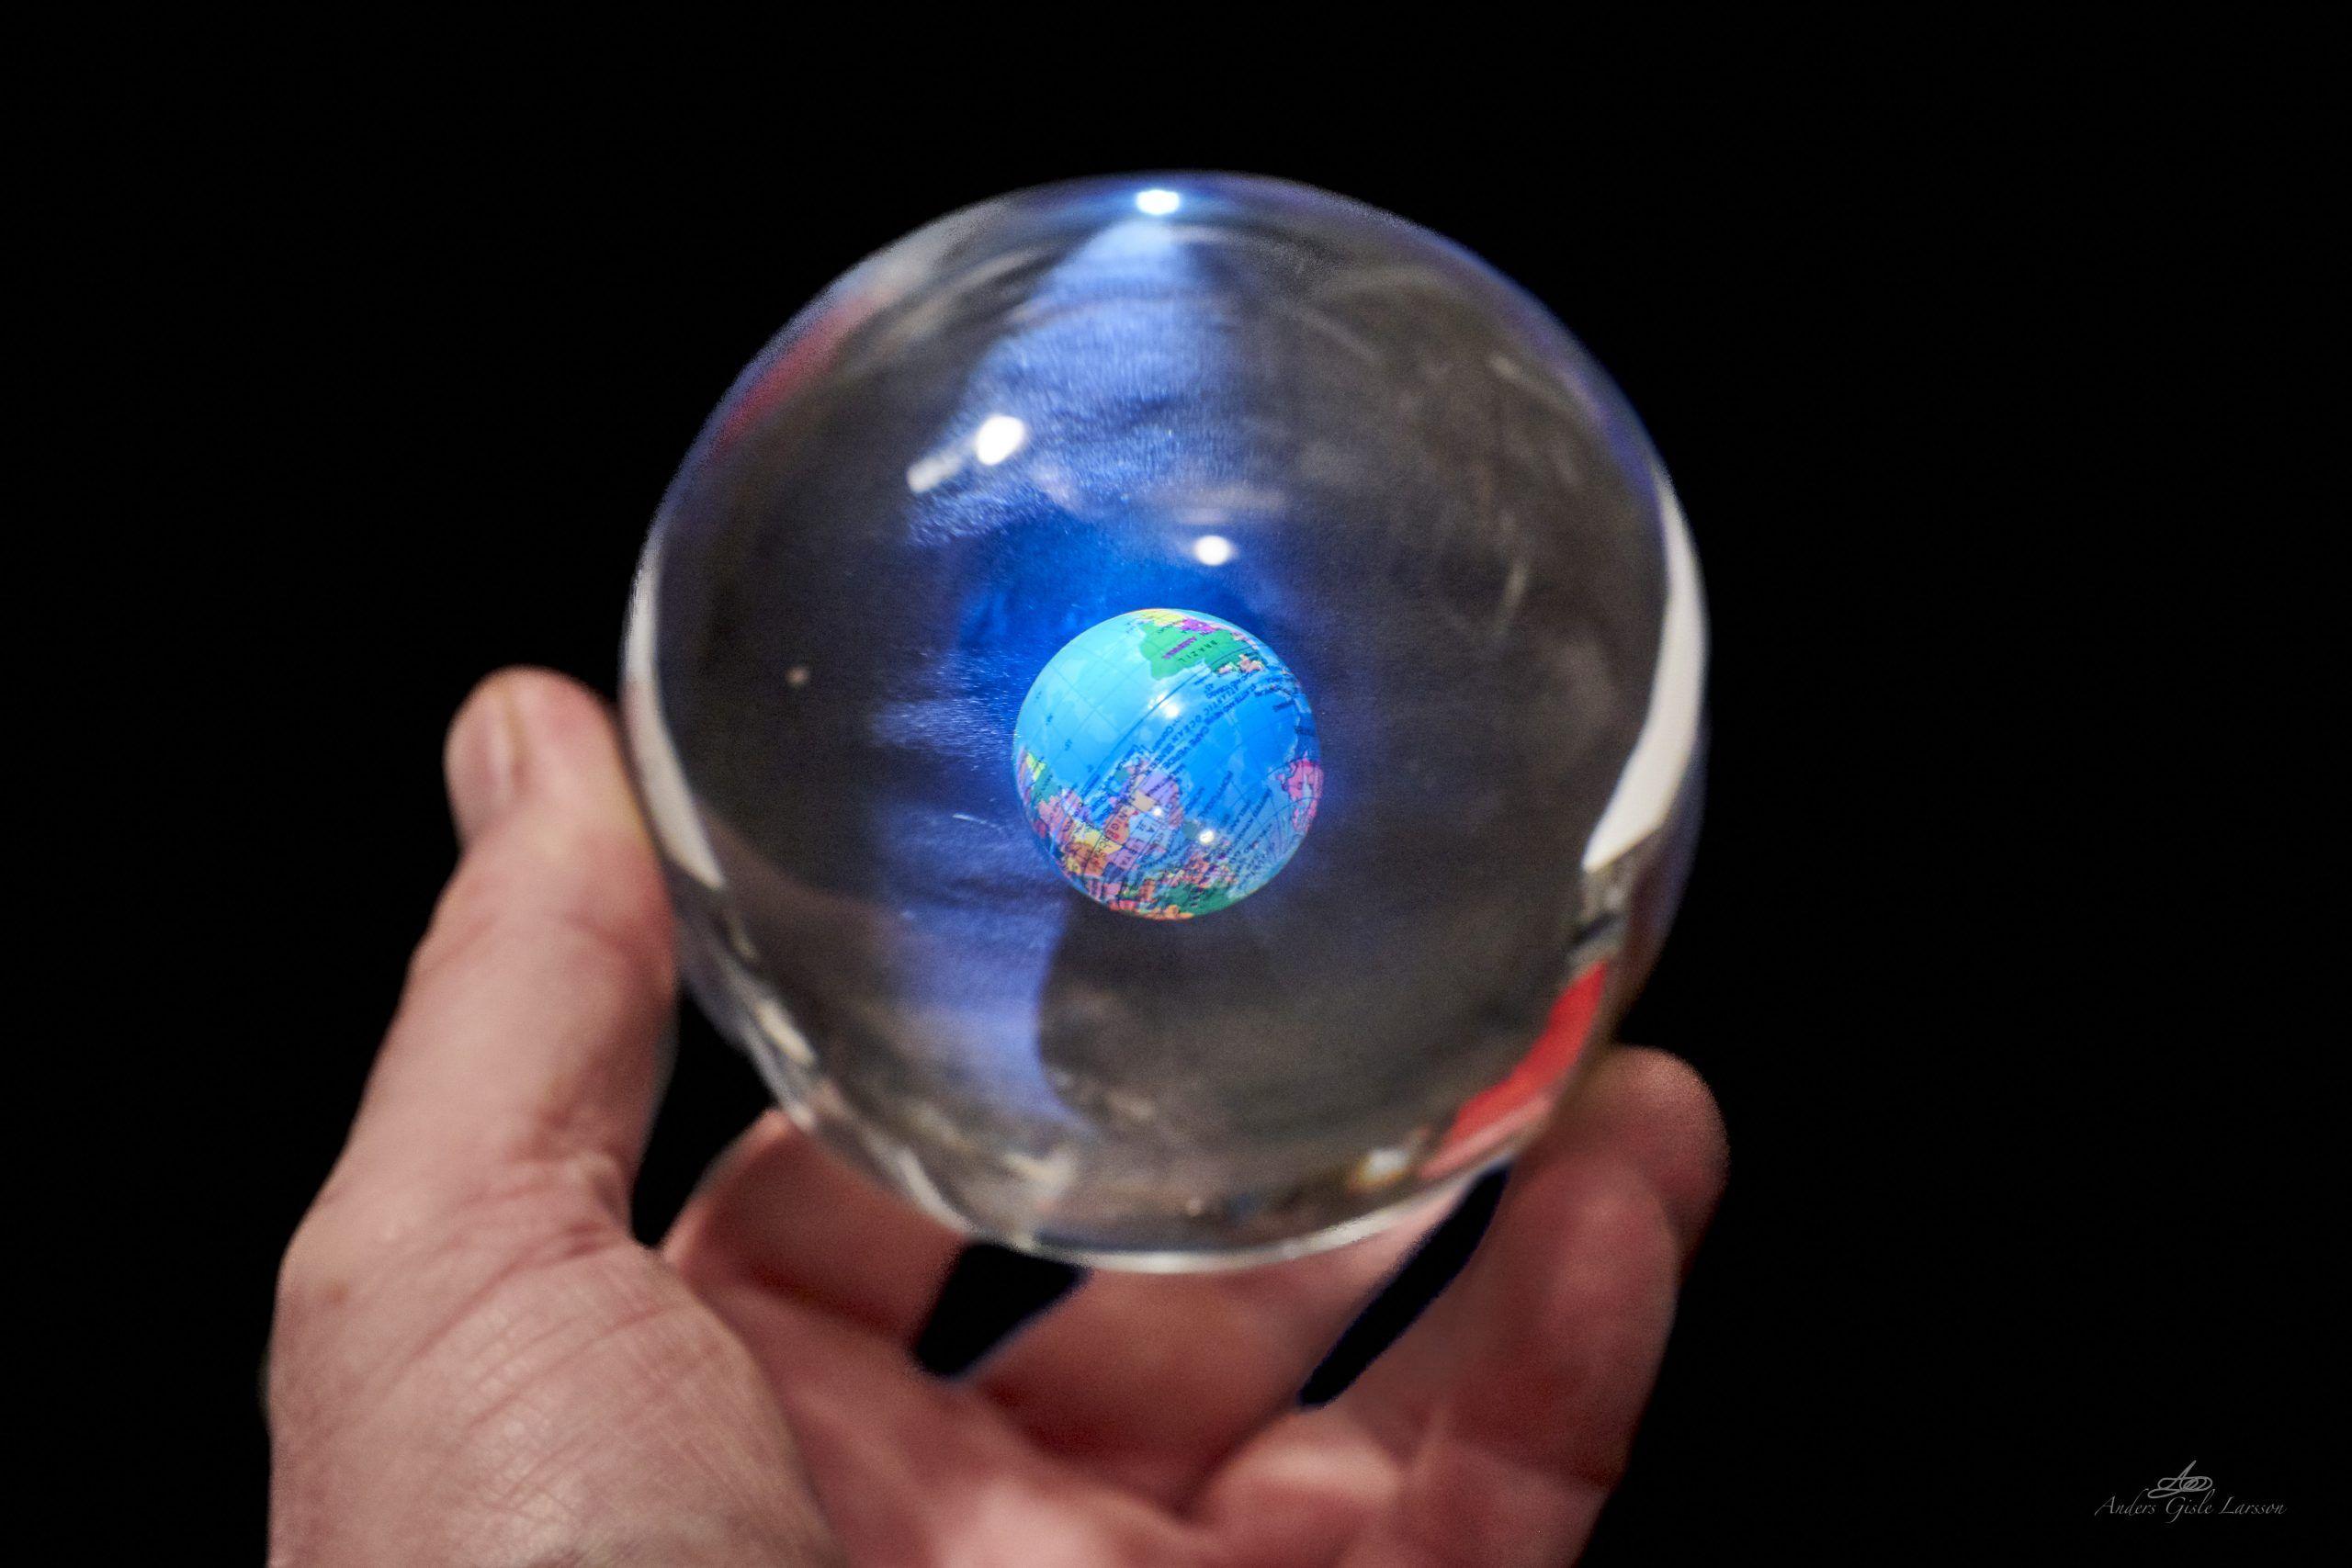 Small World, Alt er tilladt, Uge 6, 38/365, Assentoft, Randers